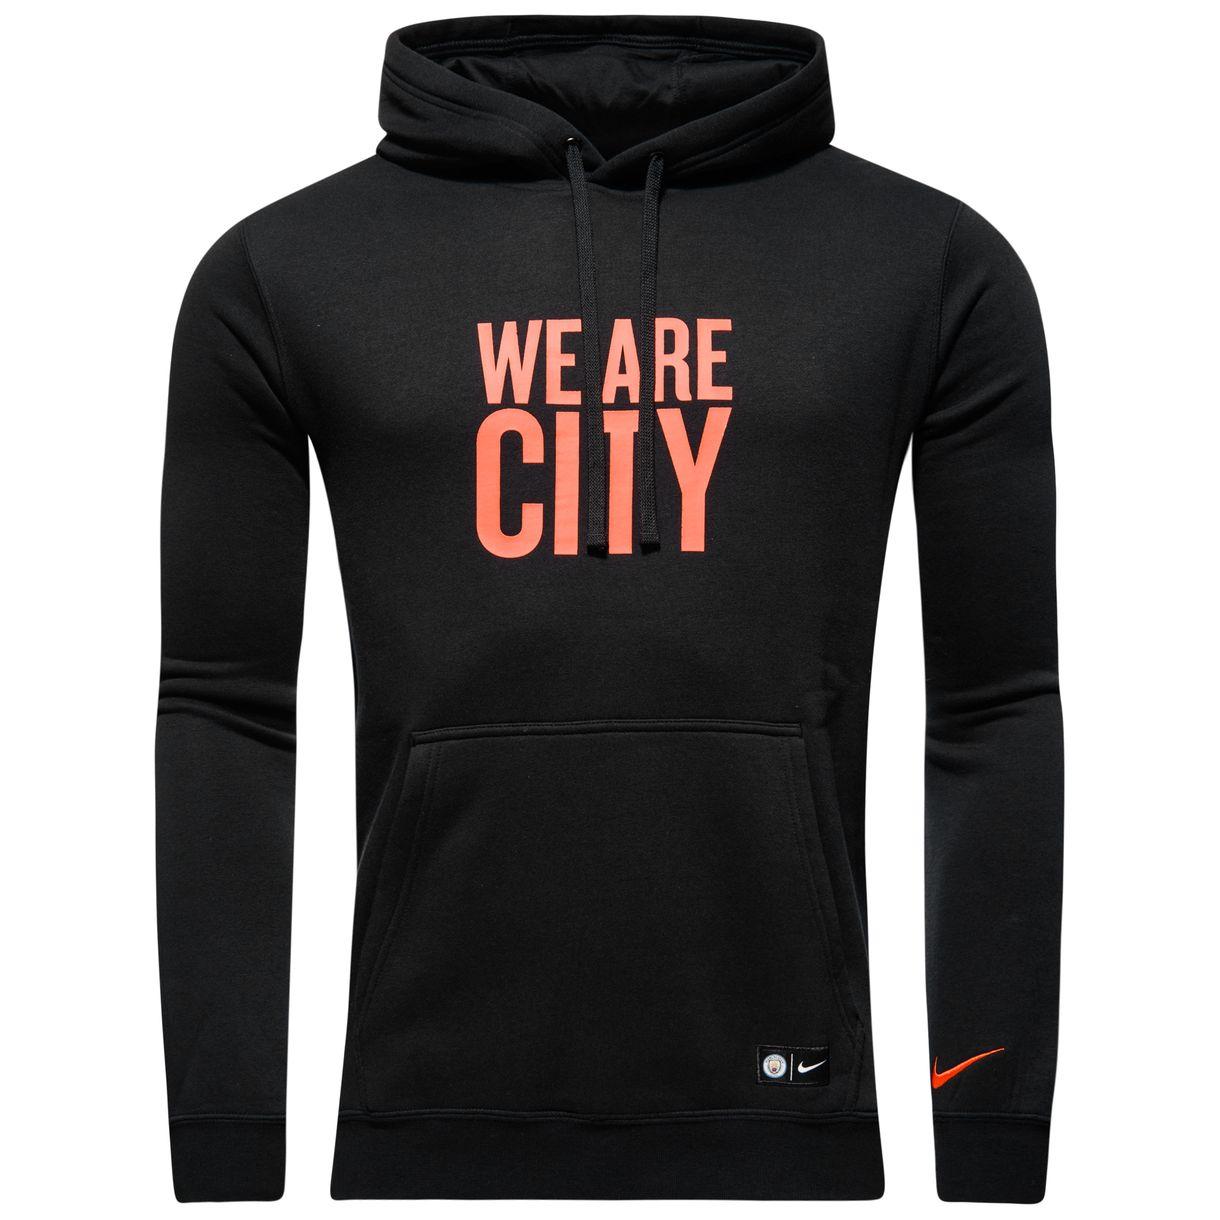 2016-2017 Man City Nike Core Hooded Top (Black)